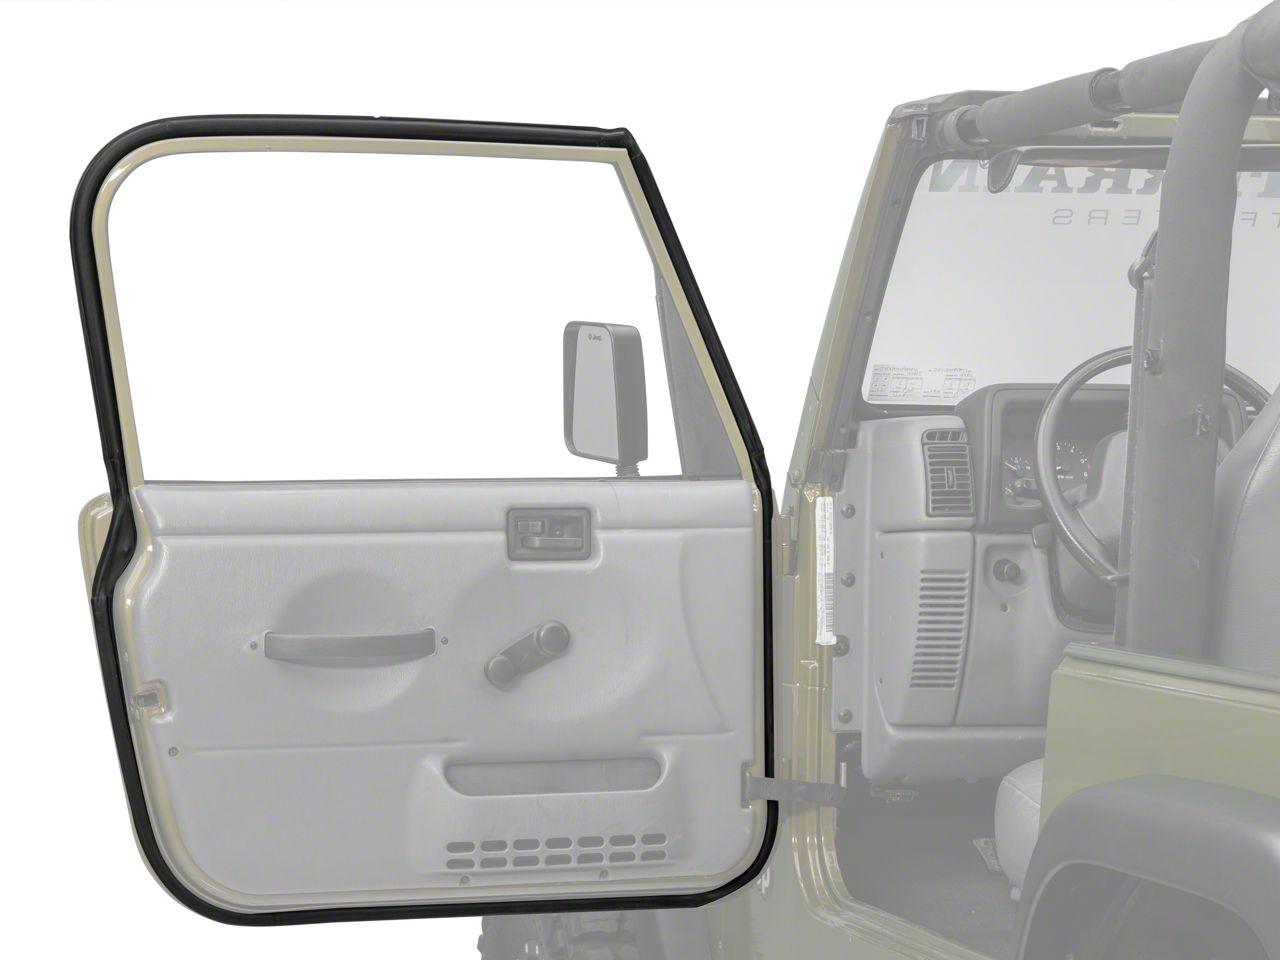 Add Drivers Side Door Seal (97-06 Wrangler TJ)